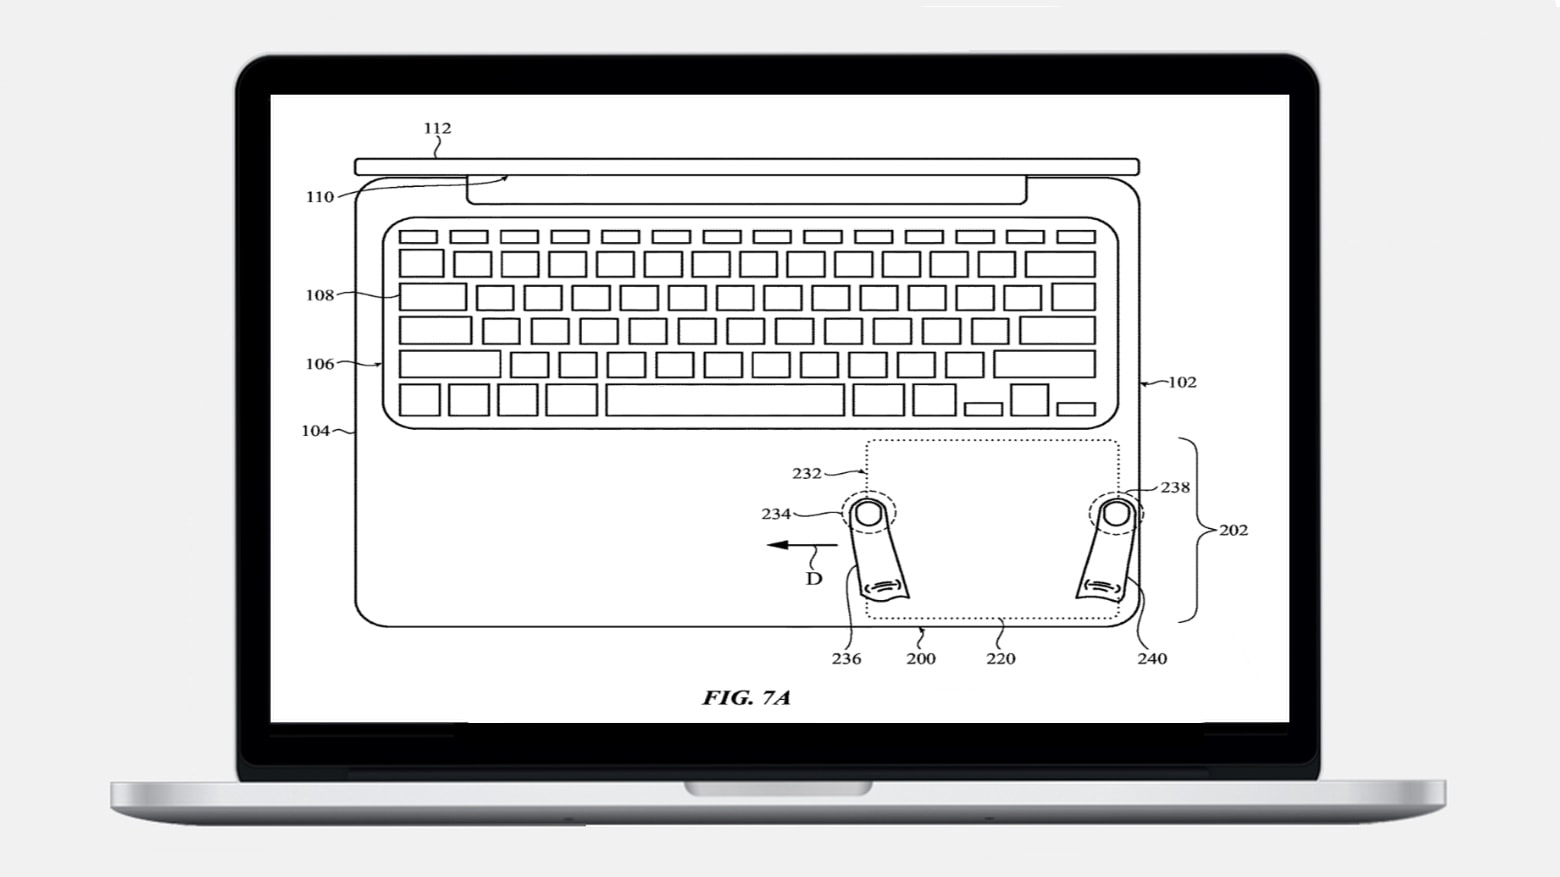 apple trackpad patent